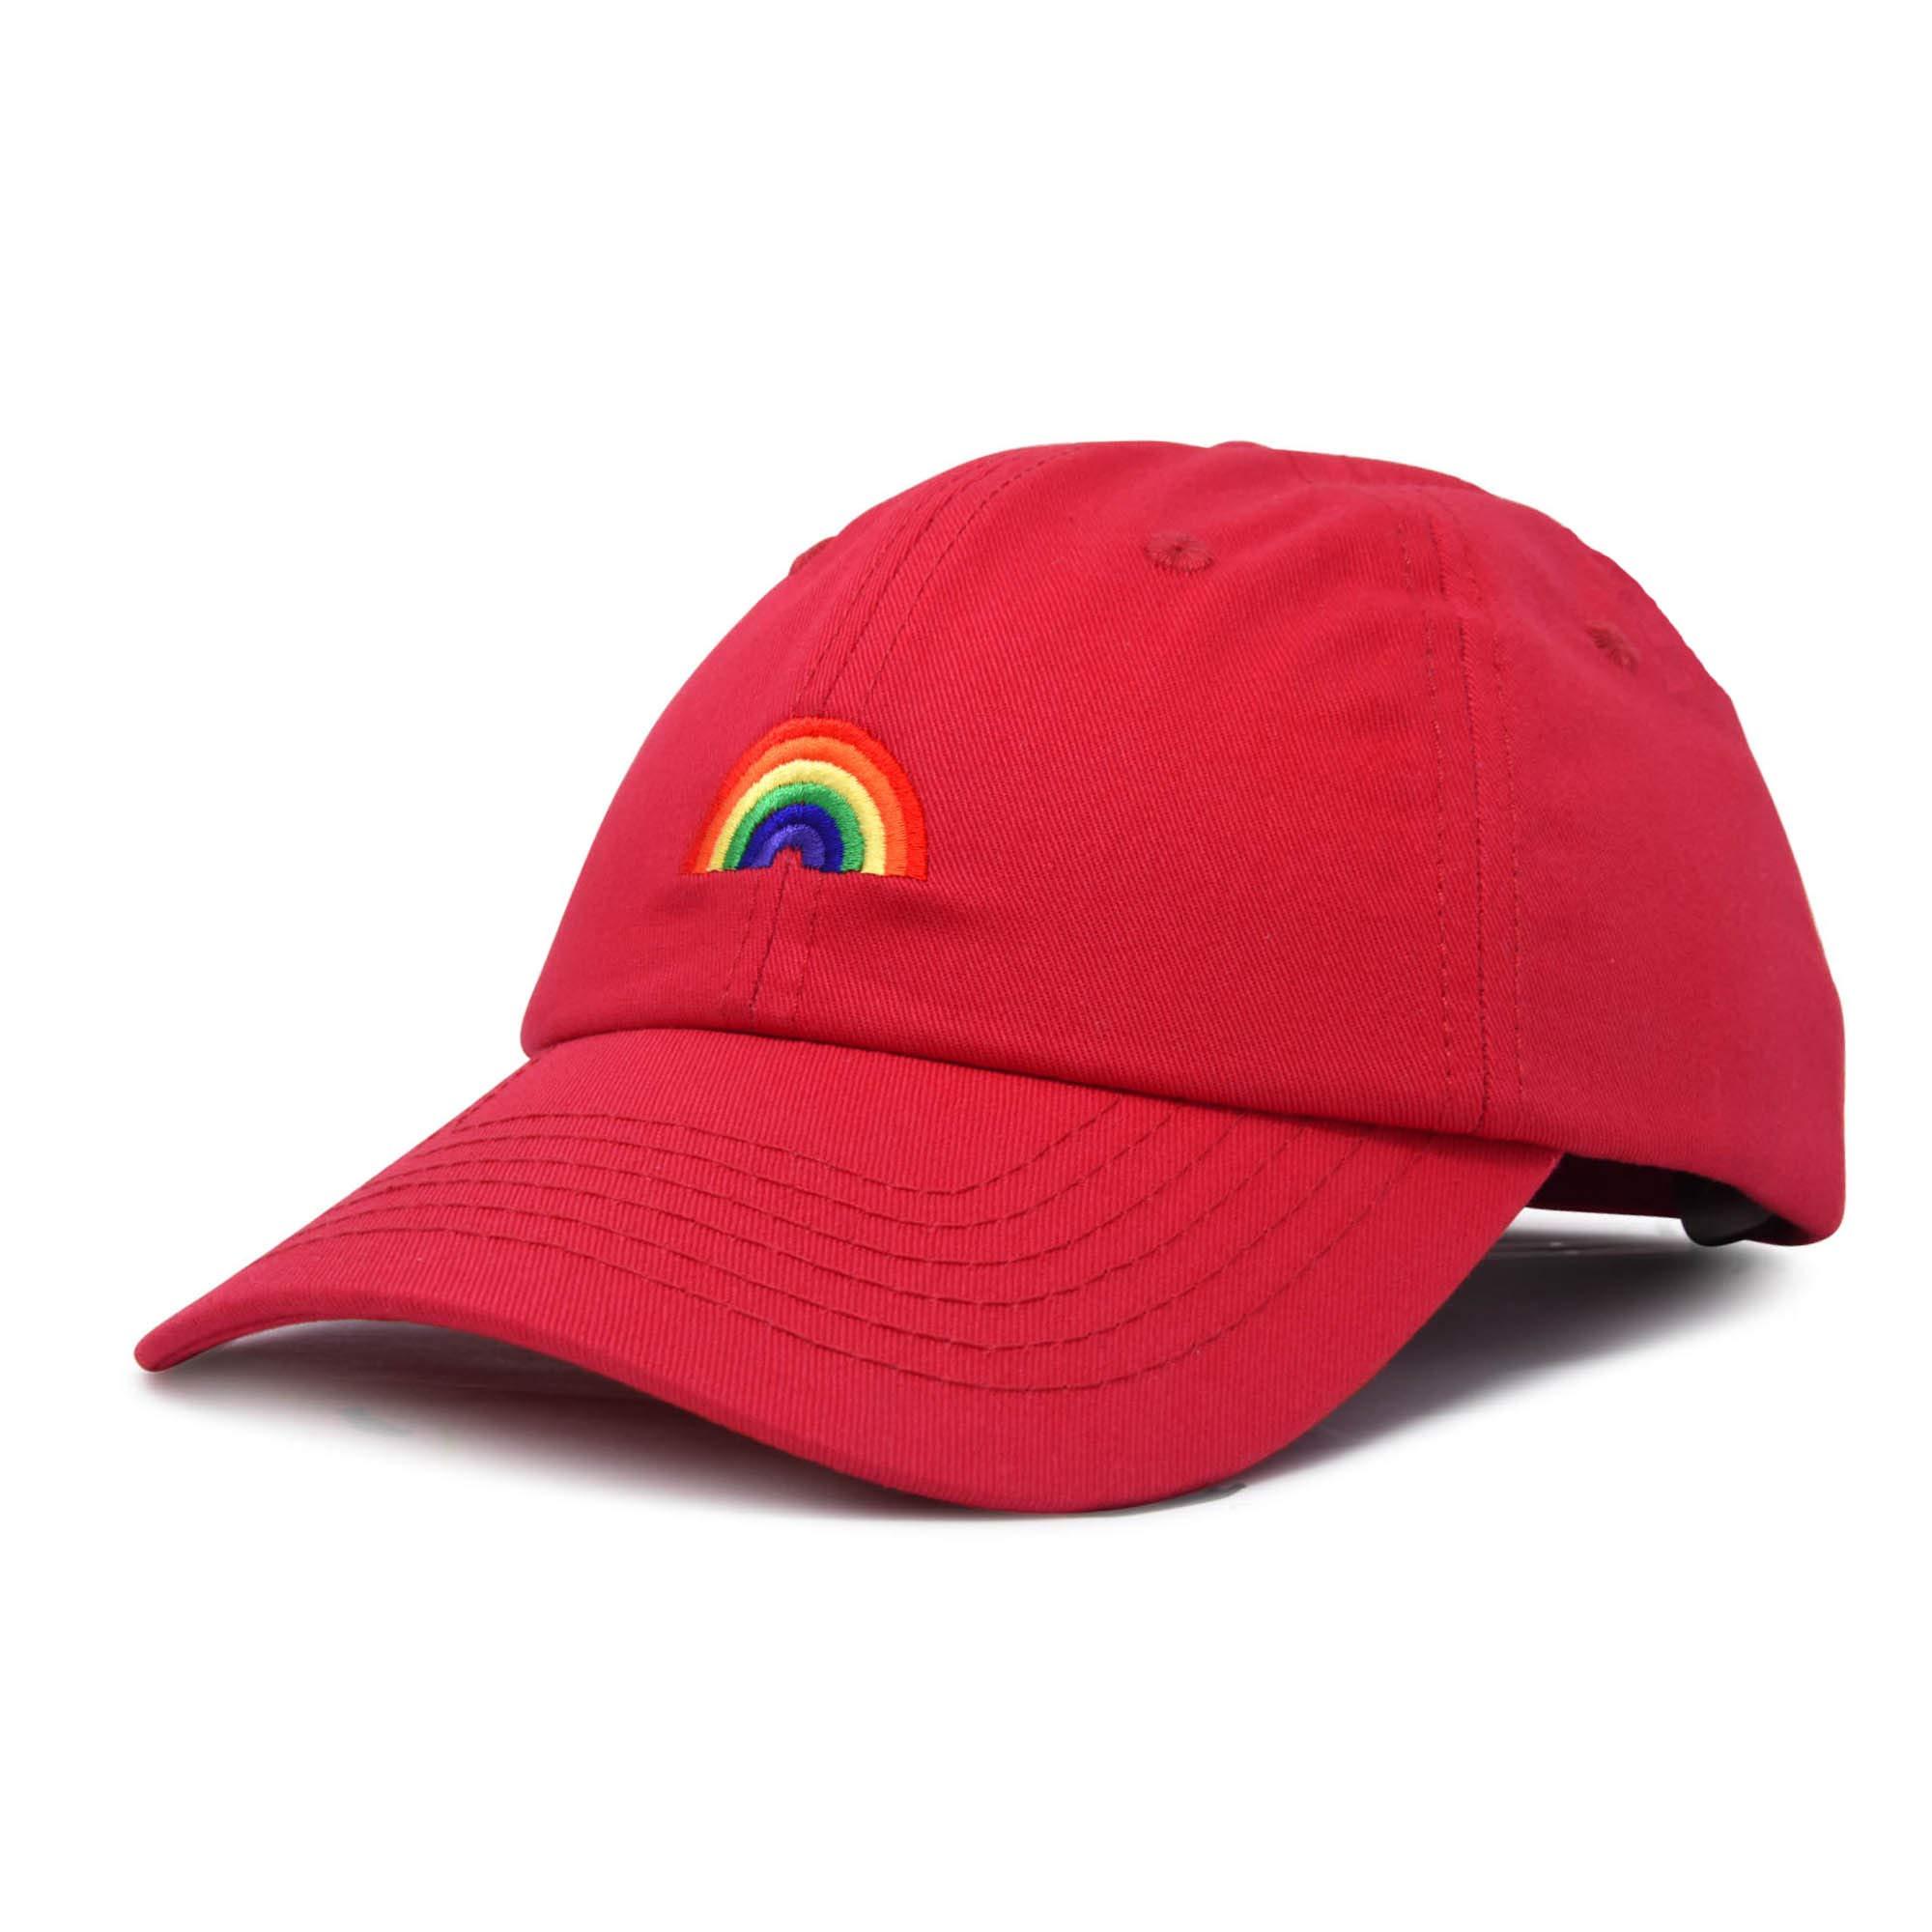 DALIX Rainbow Baseball Cap Womens Hats Cute Hat Soft Cotton Caps in Red